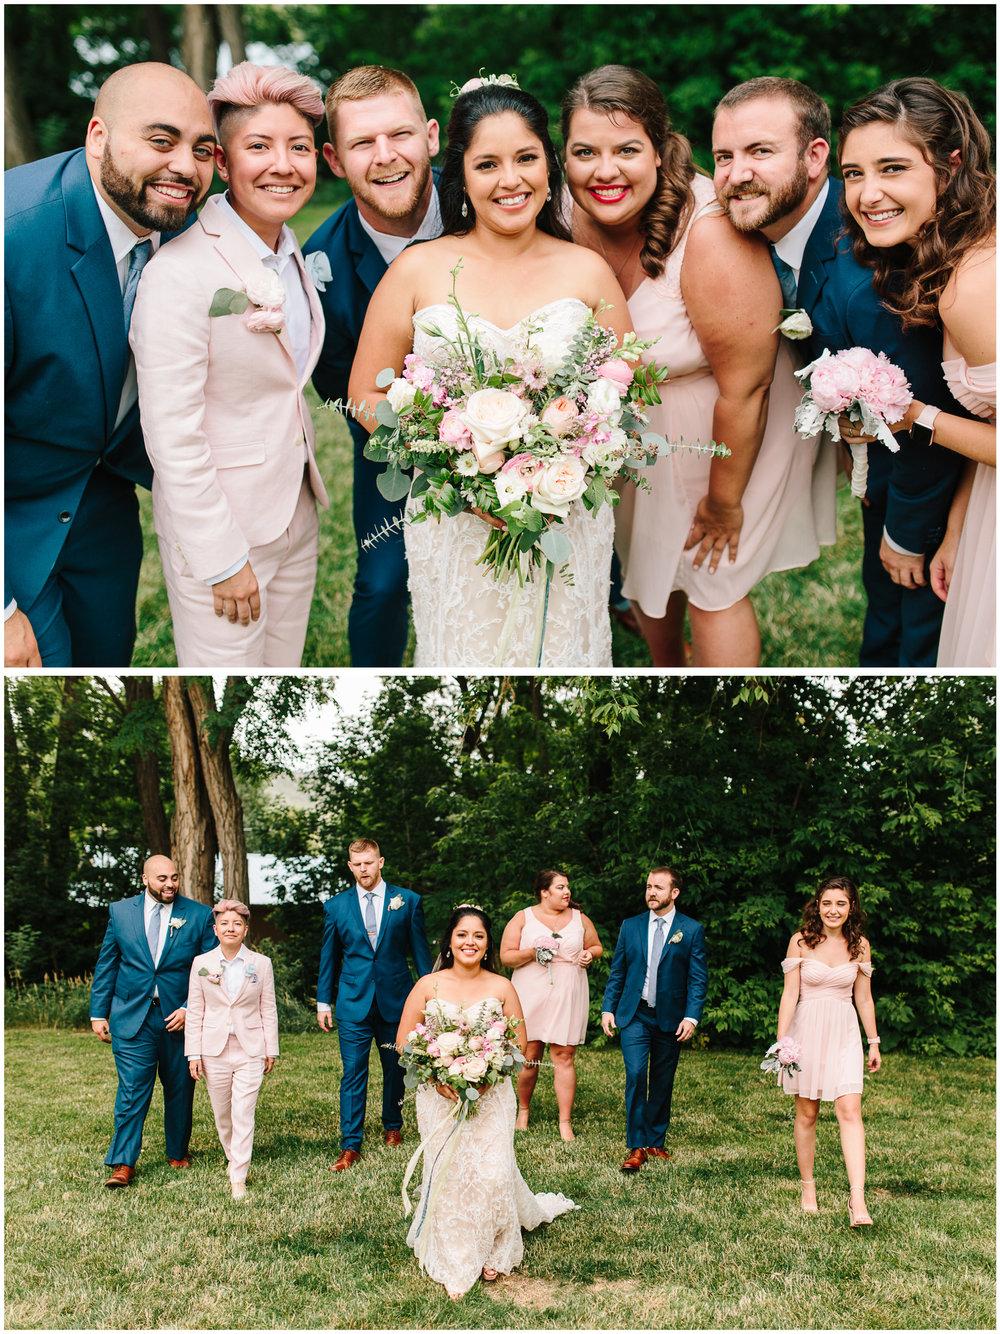 lyons_farmette_wedding_35.jpg